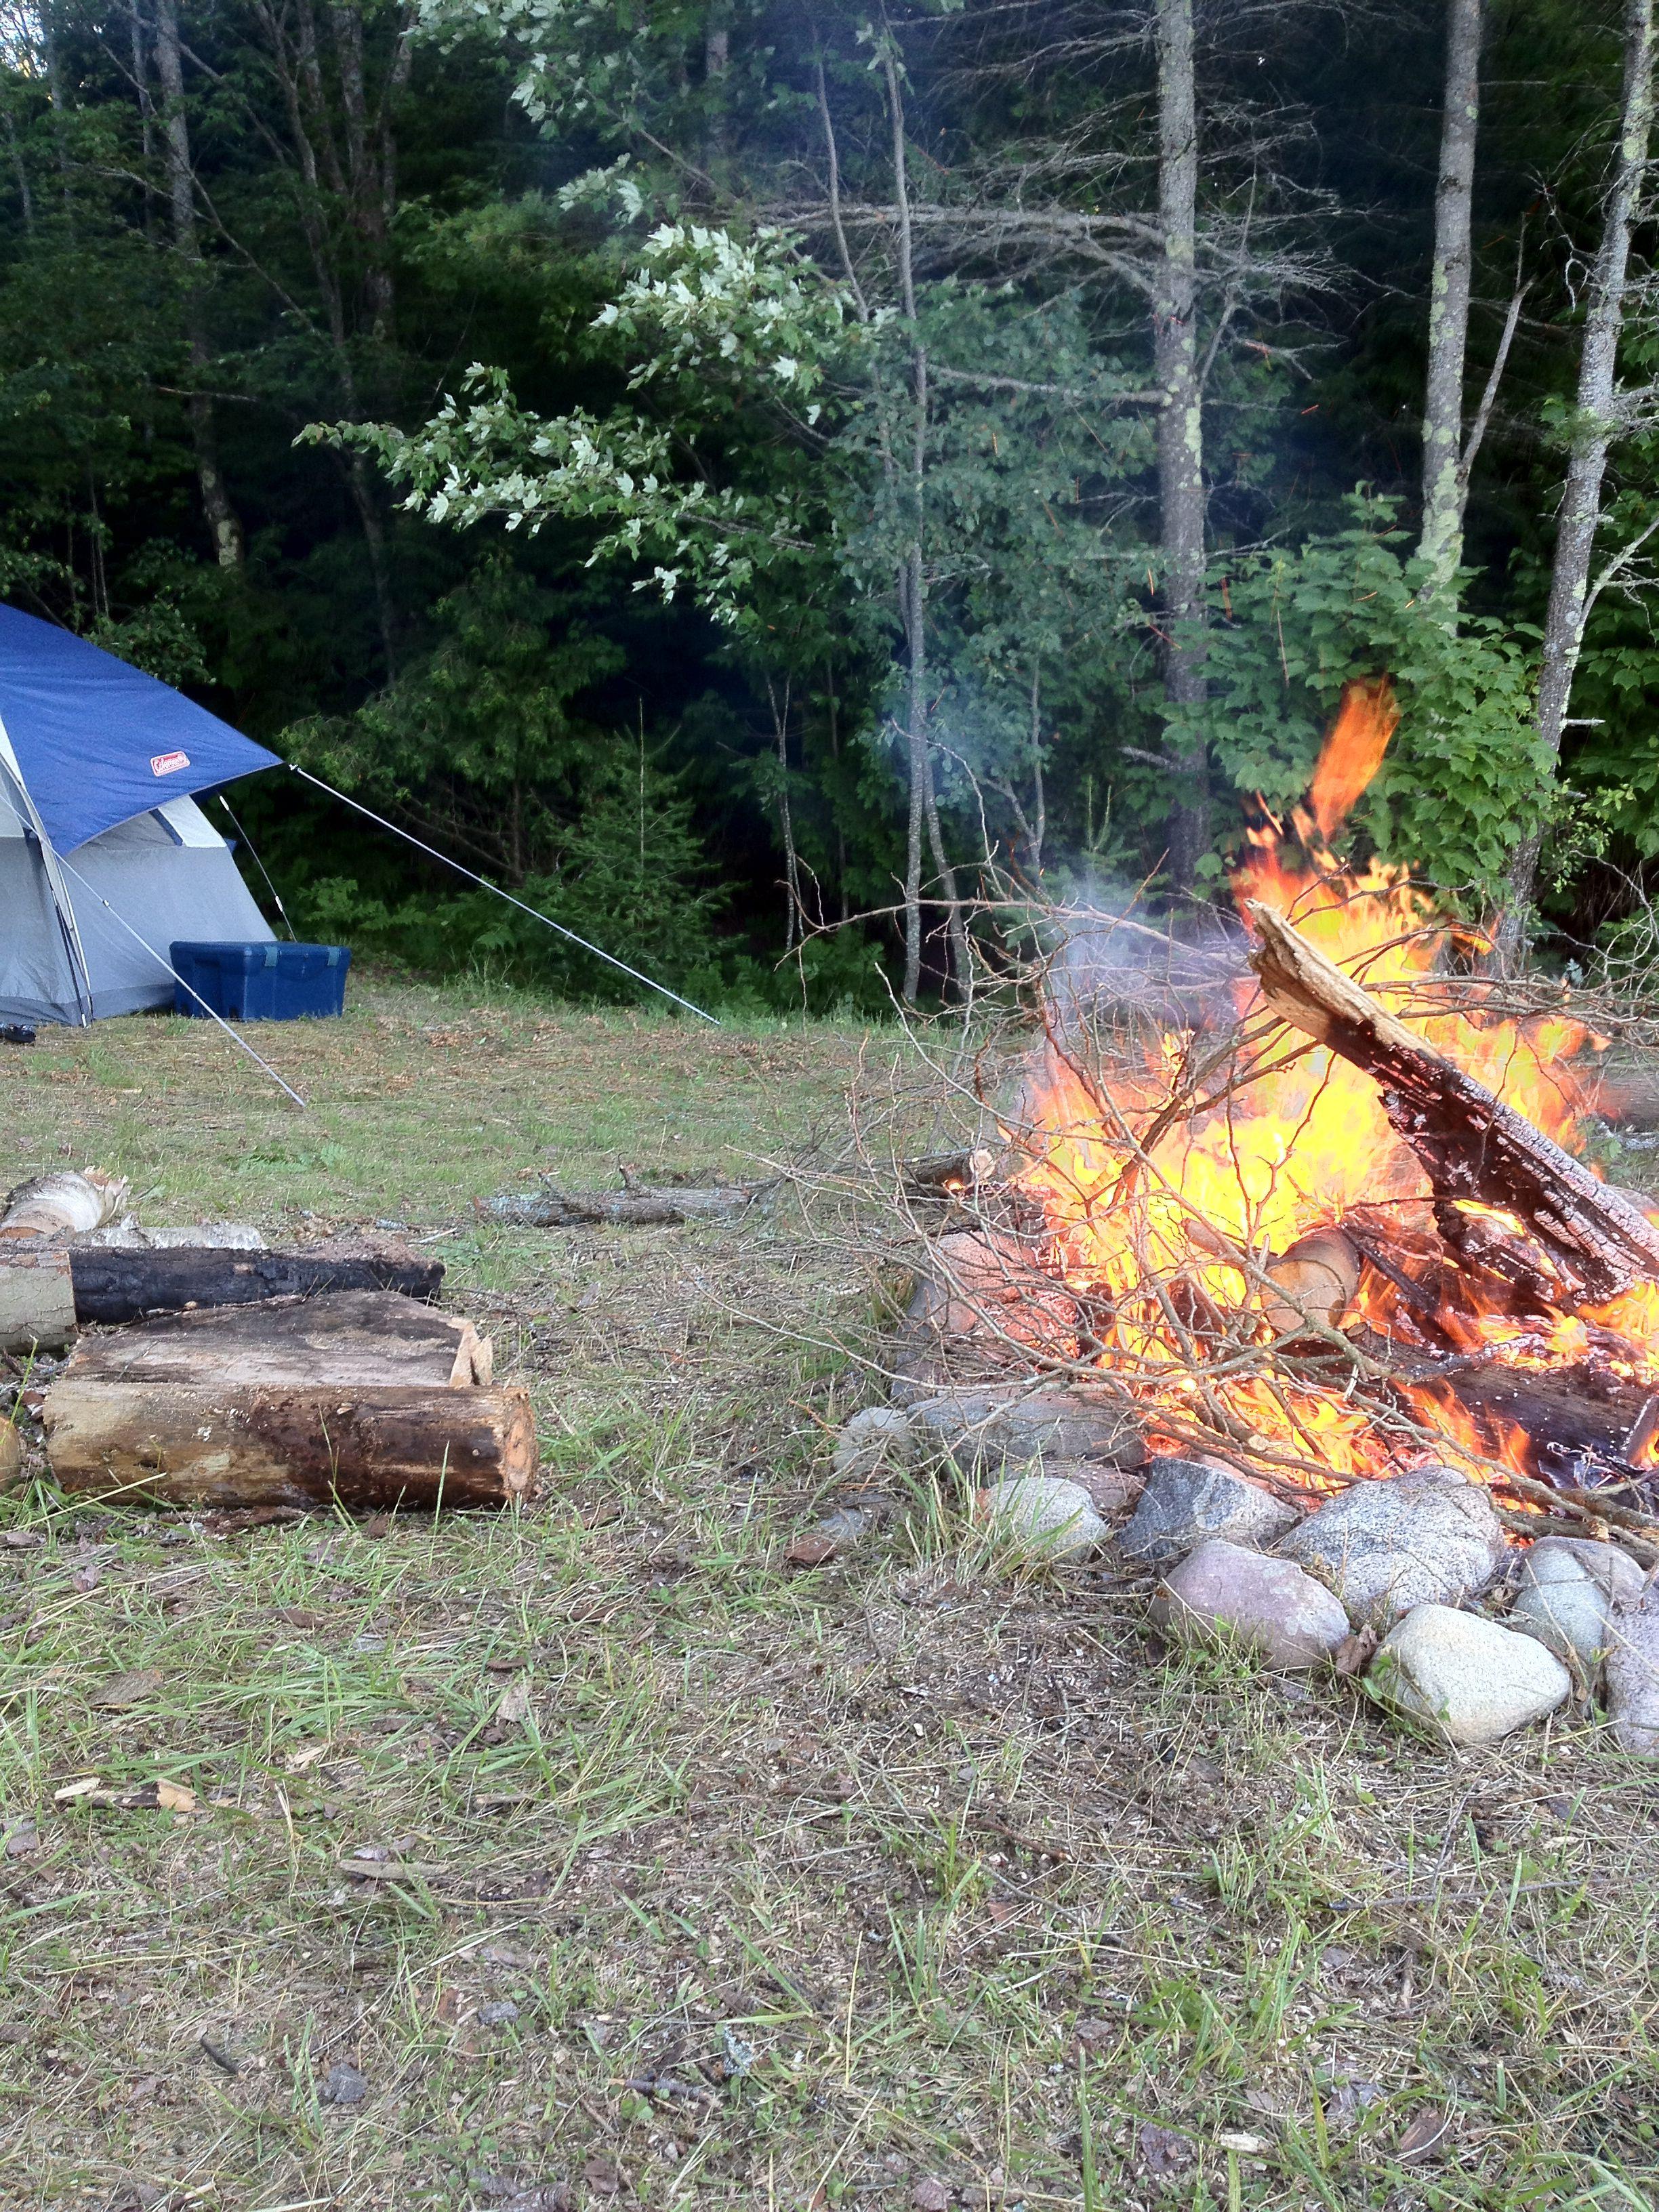 Bond Falls: Camp Near Waterfalls in Michigans Upper Peninsula